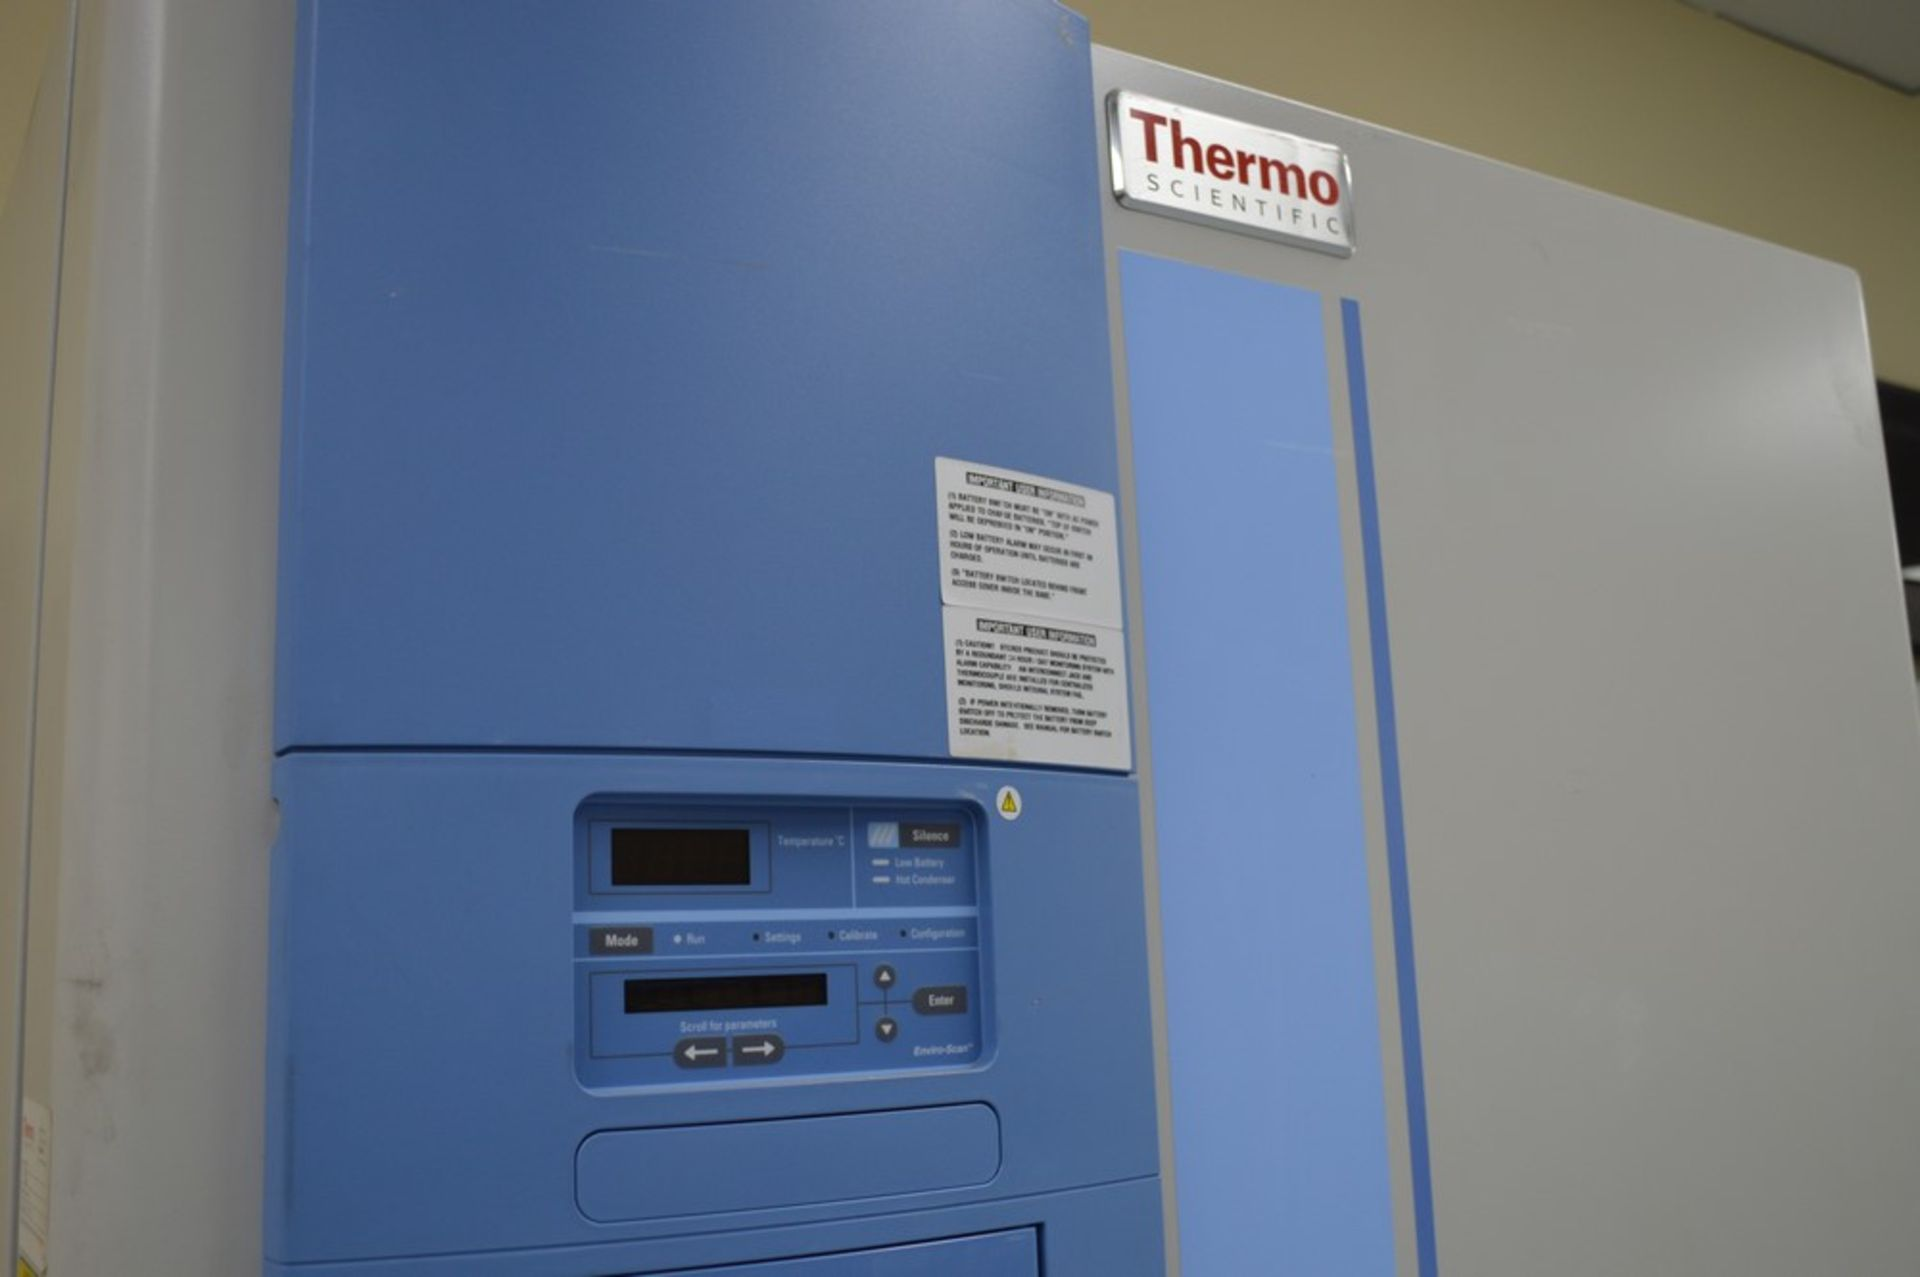 Therma Scientific Forma 8600 Series, Model 8656 Deep Freeze Refrigorator (-86 F) - Image 3 of 7